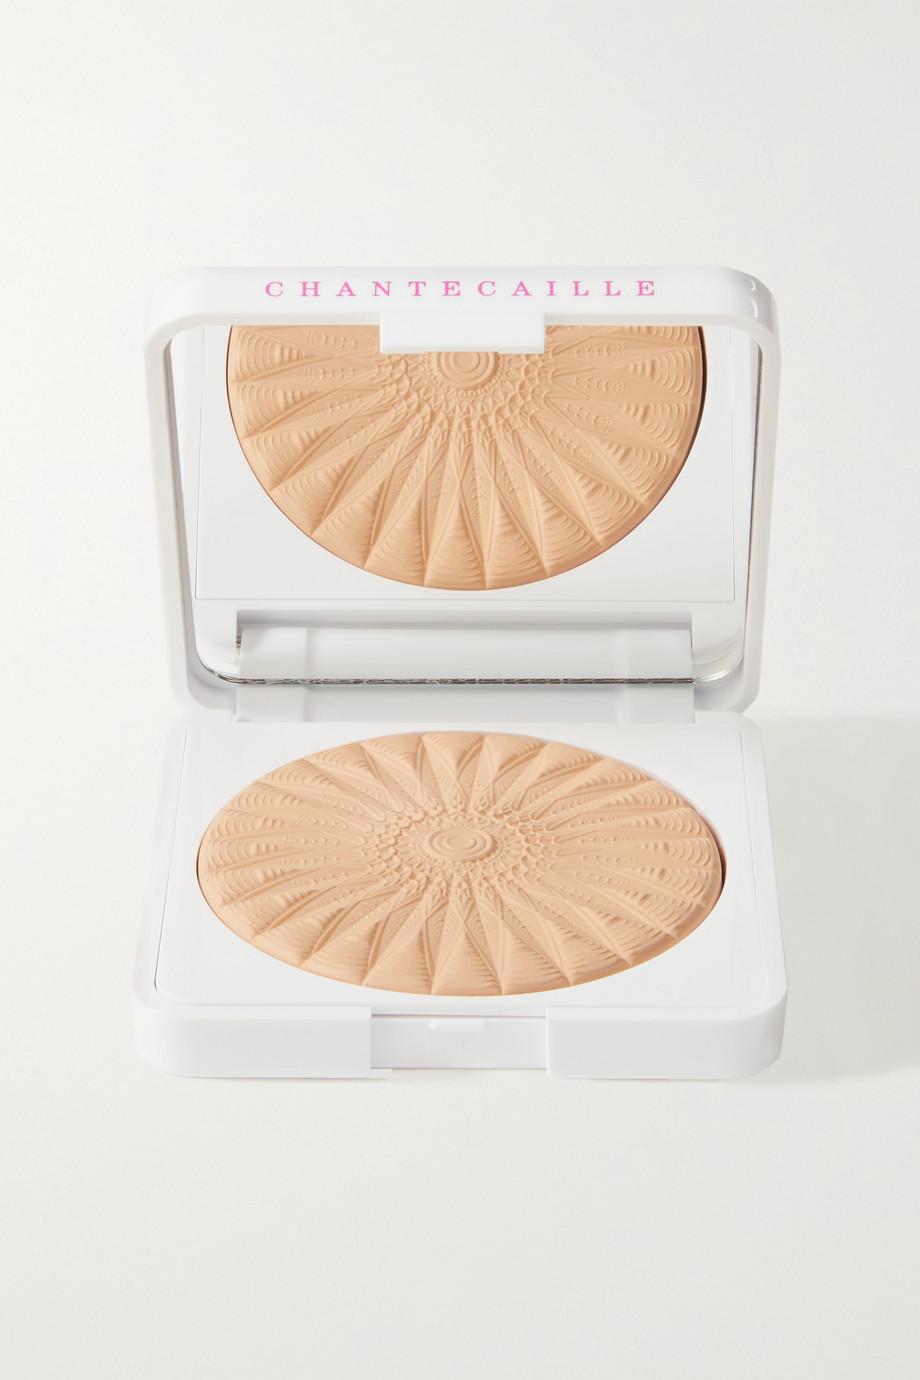 Chantecaille Perfect Blur Finishing Powder - Light/Medium